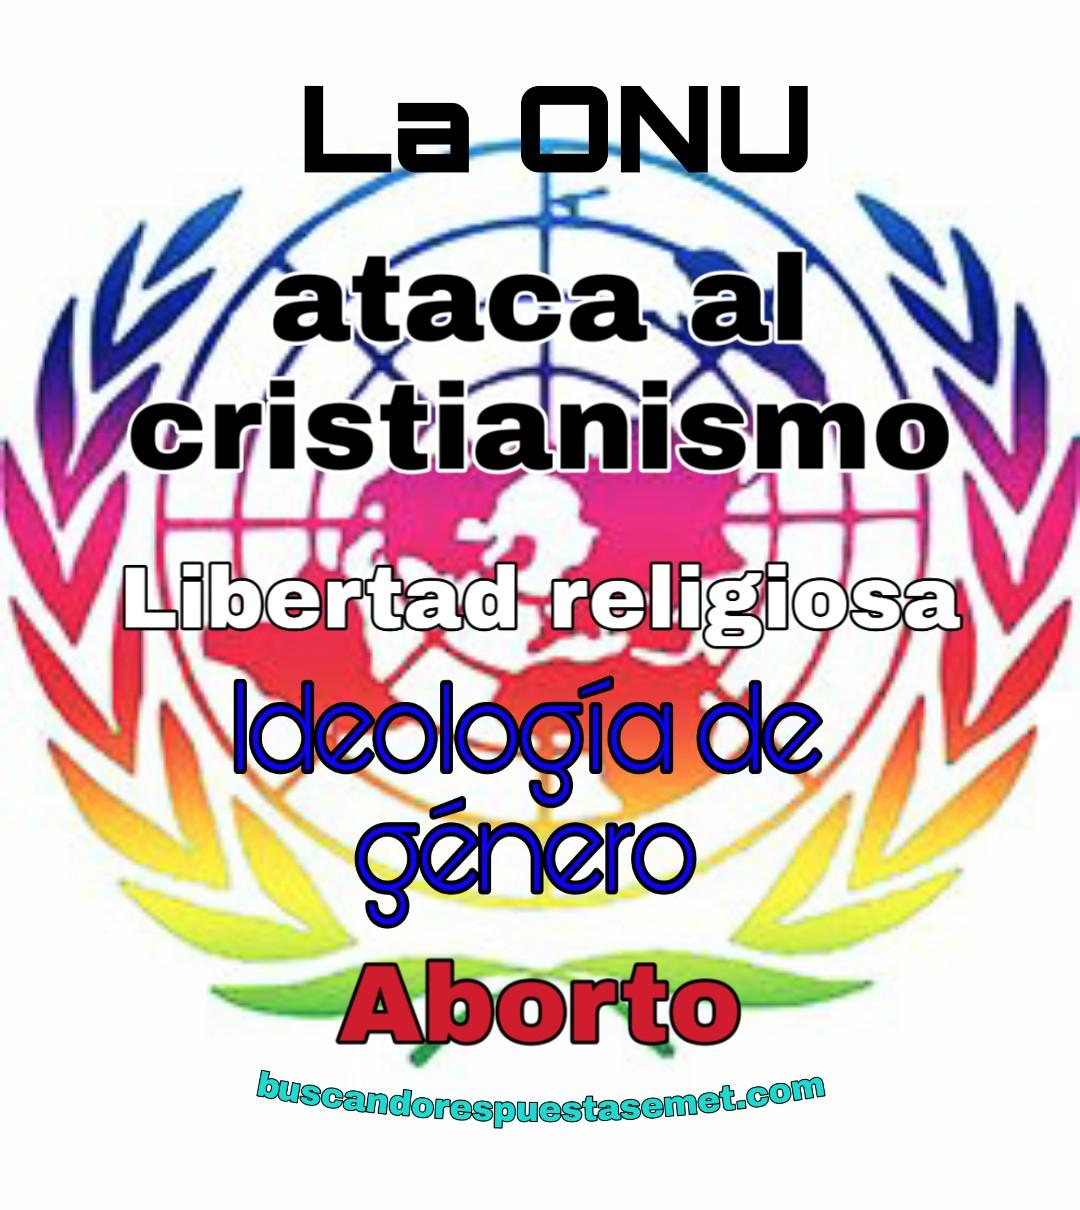 La ONU ataca al cristianismo. Ideología de género. Libertad religiosa. Aborto.